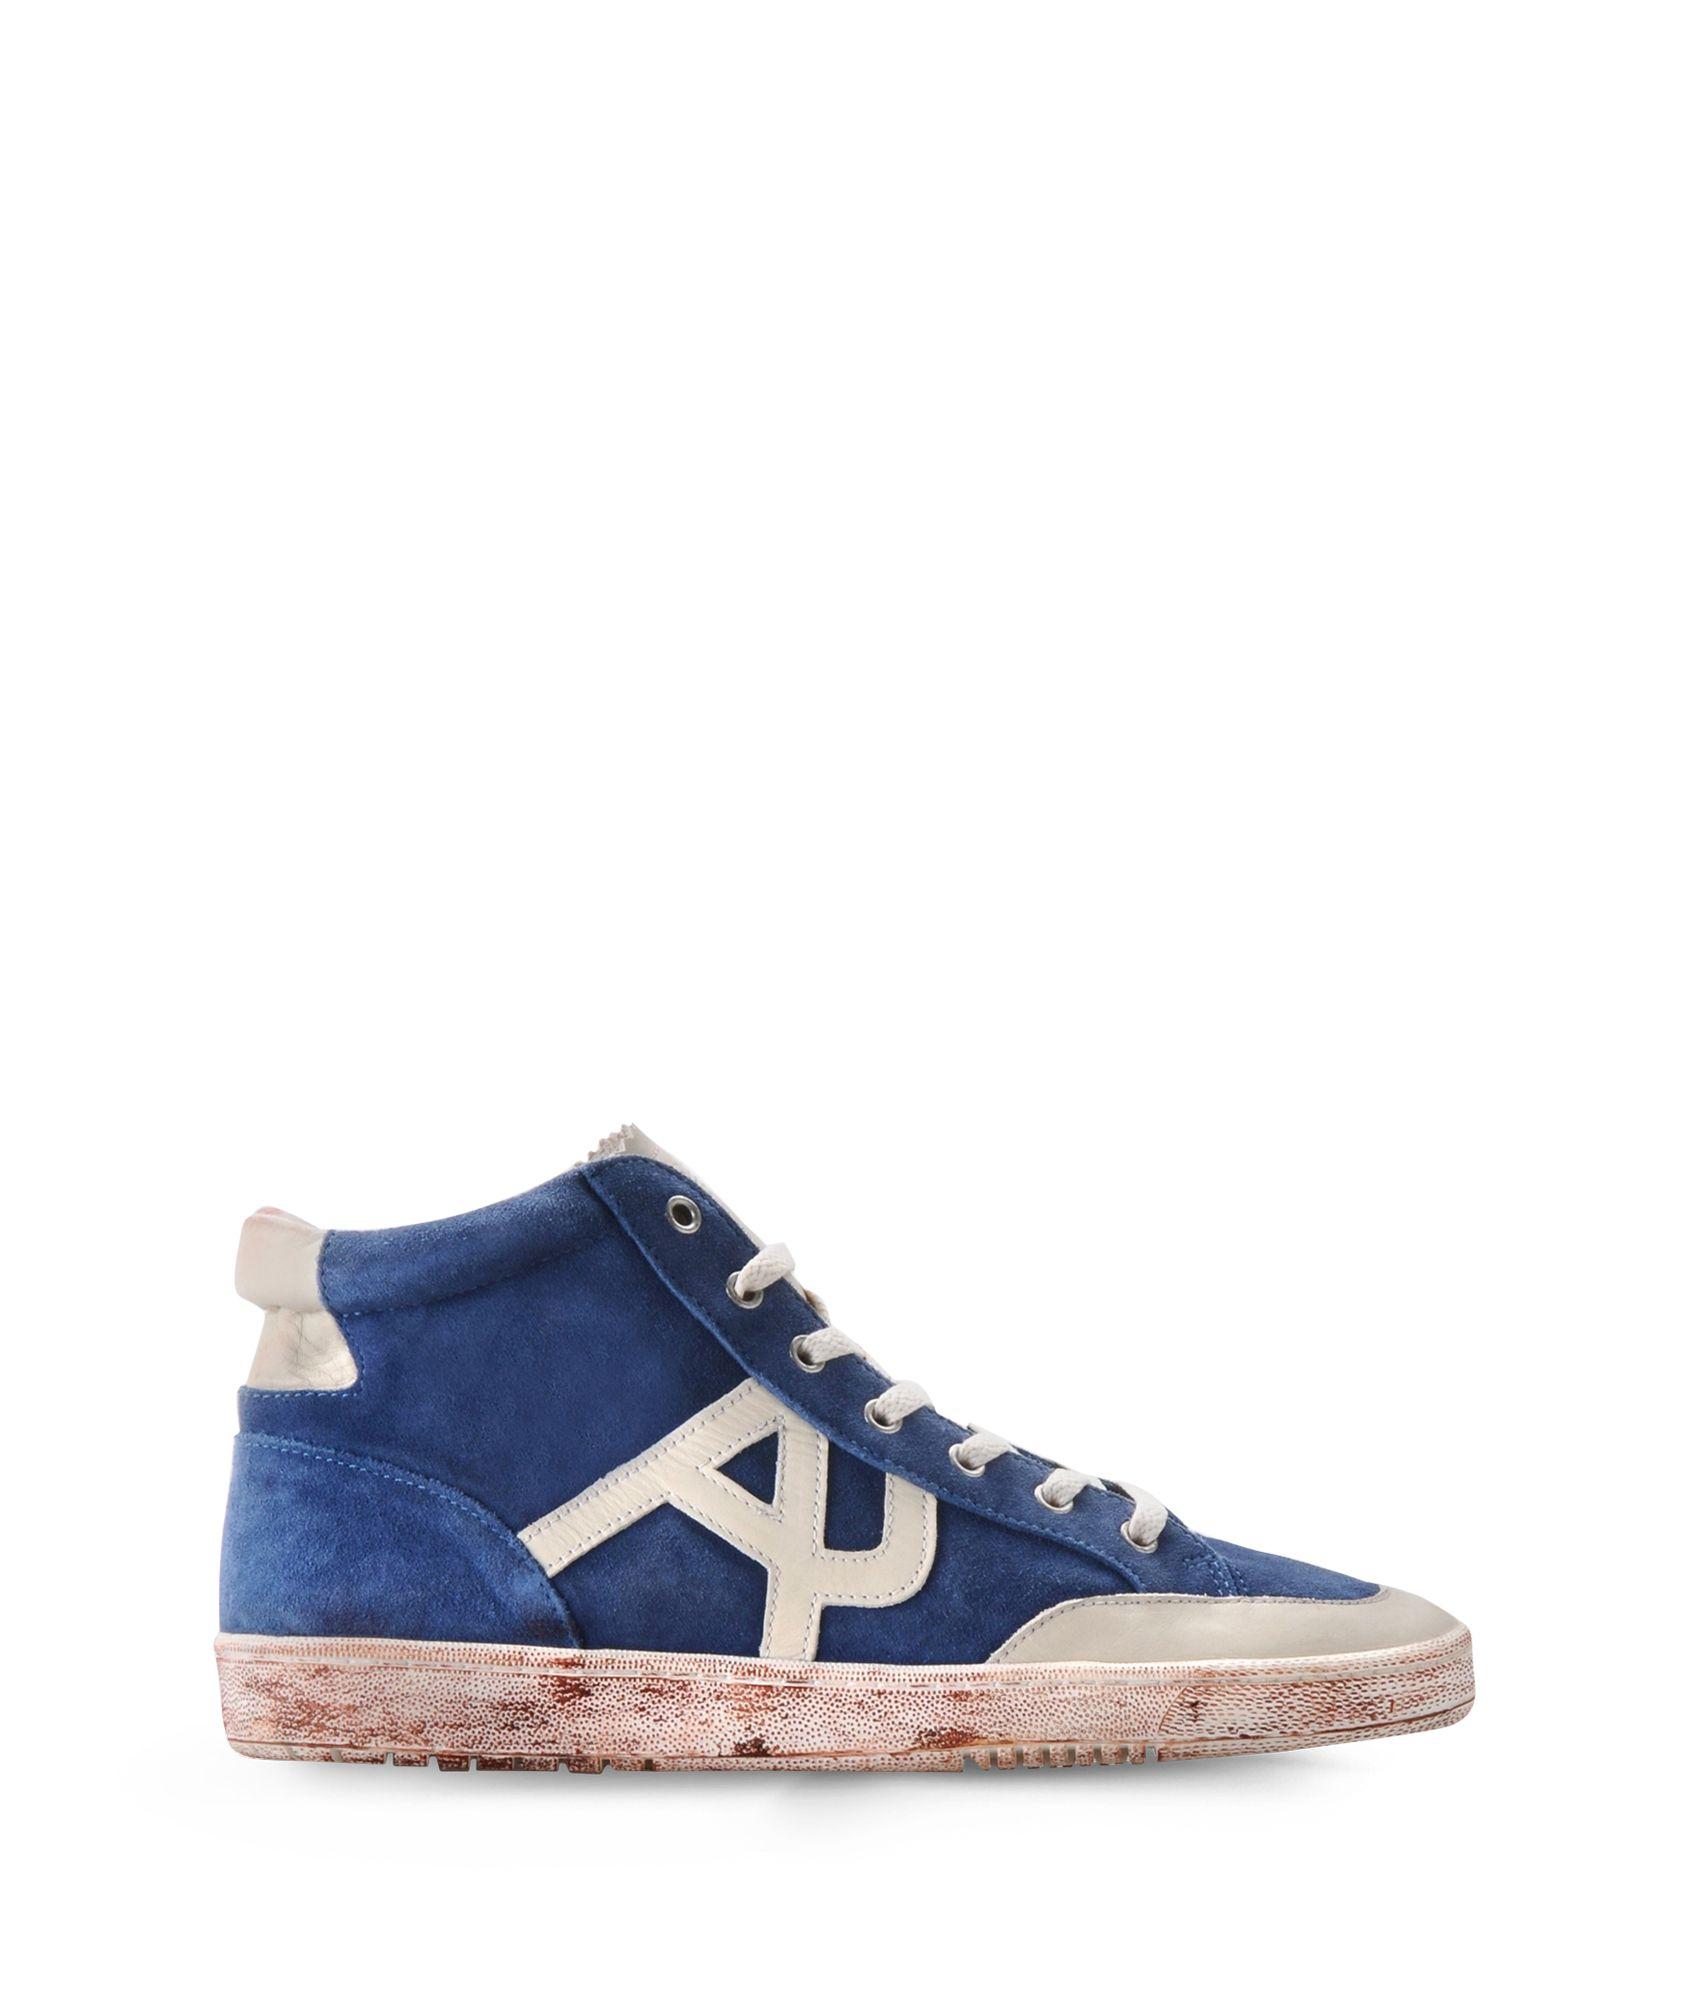 armani jeans hightop sneaker in blue for men lyst. Black Bedroom Furniture Sets. Home Design Ideas